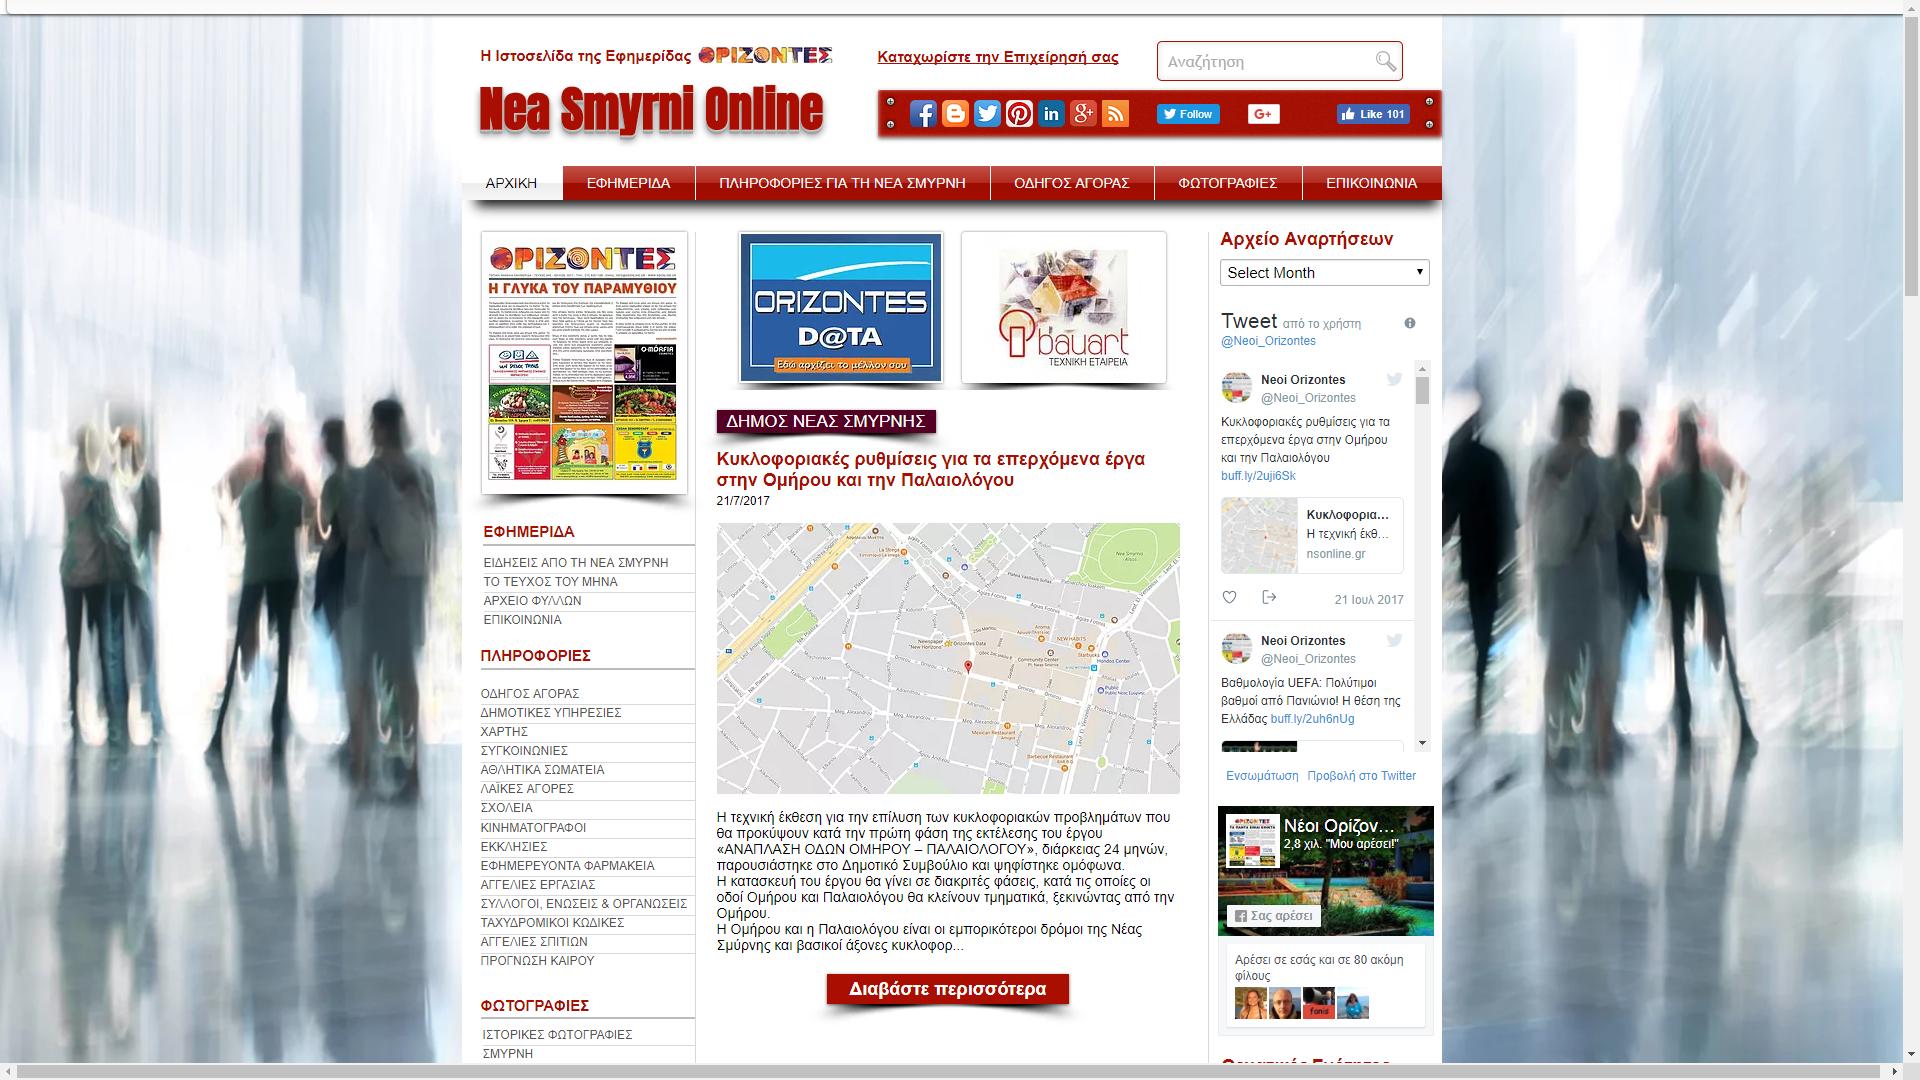 Nea Smyrni Online